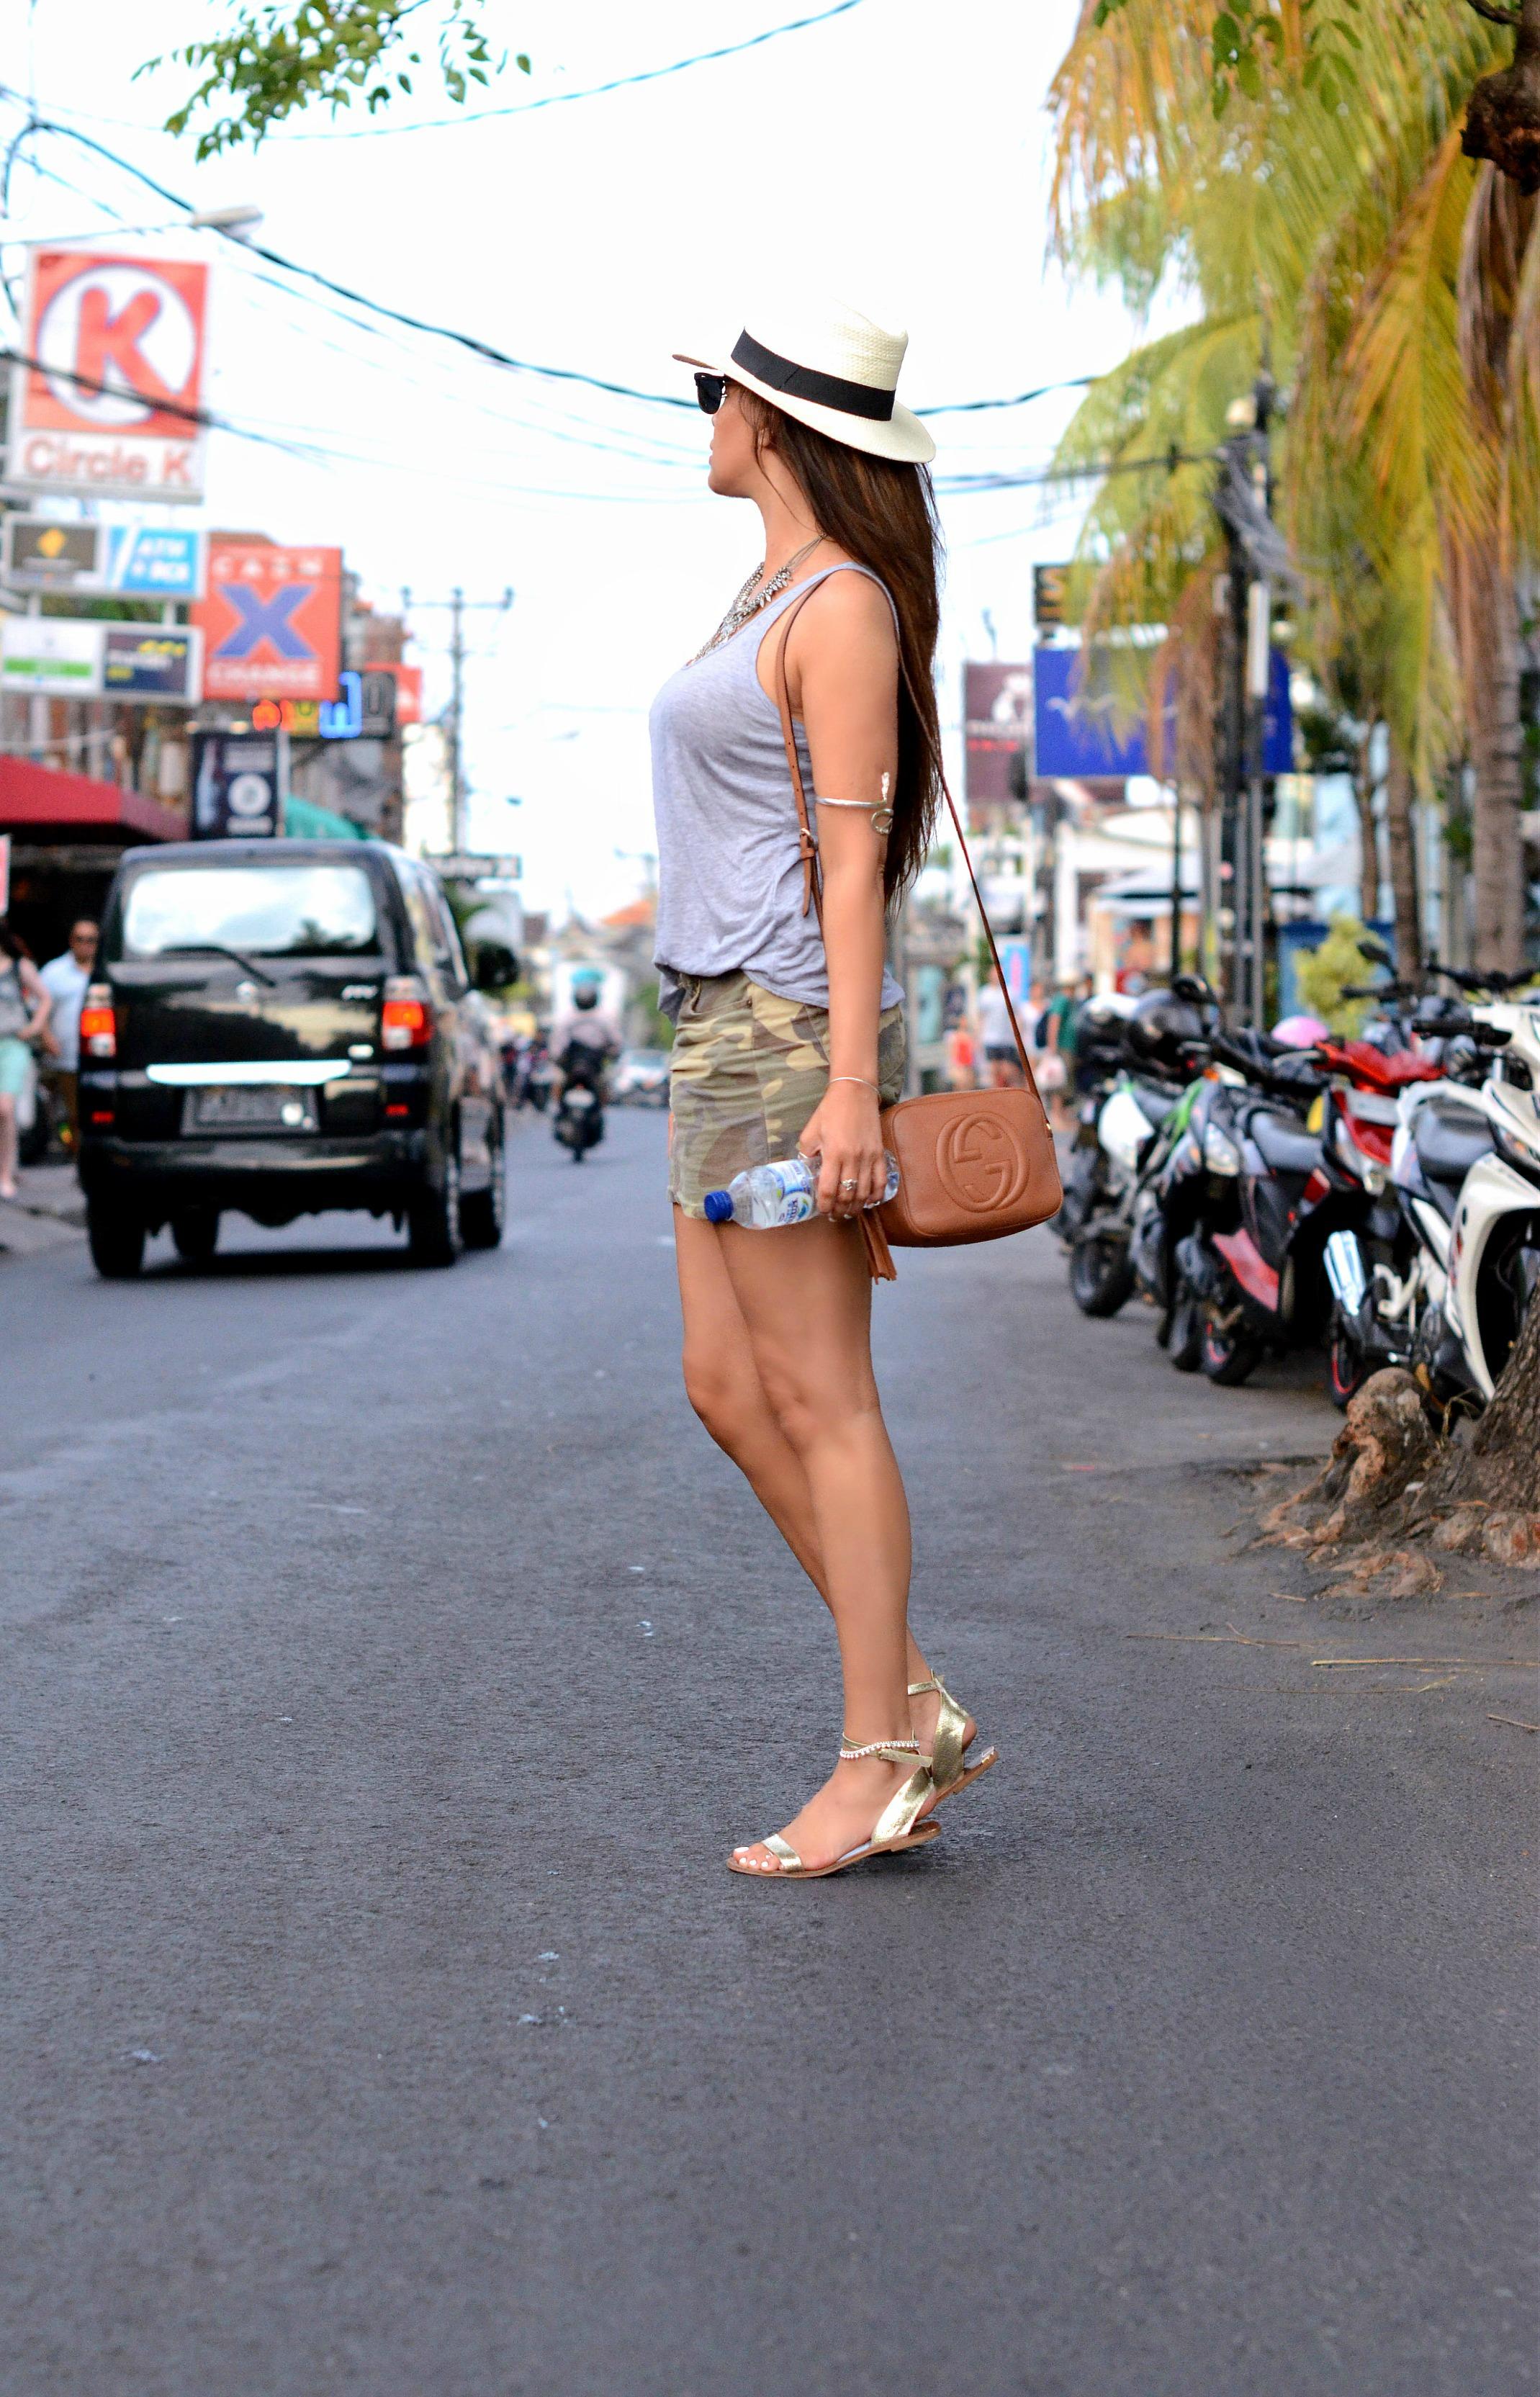 Tamara Chloé, Oberoi street, Seminyak Bali, What not to do in Bali2